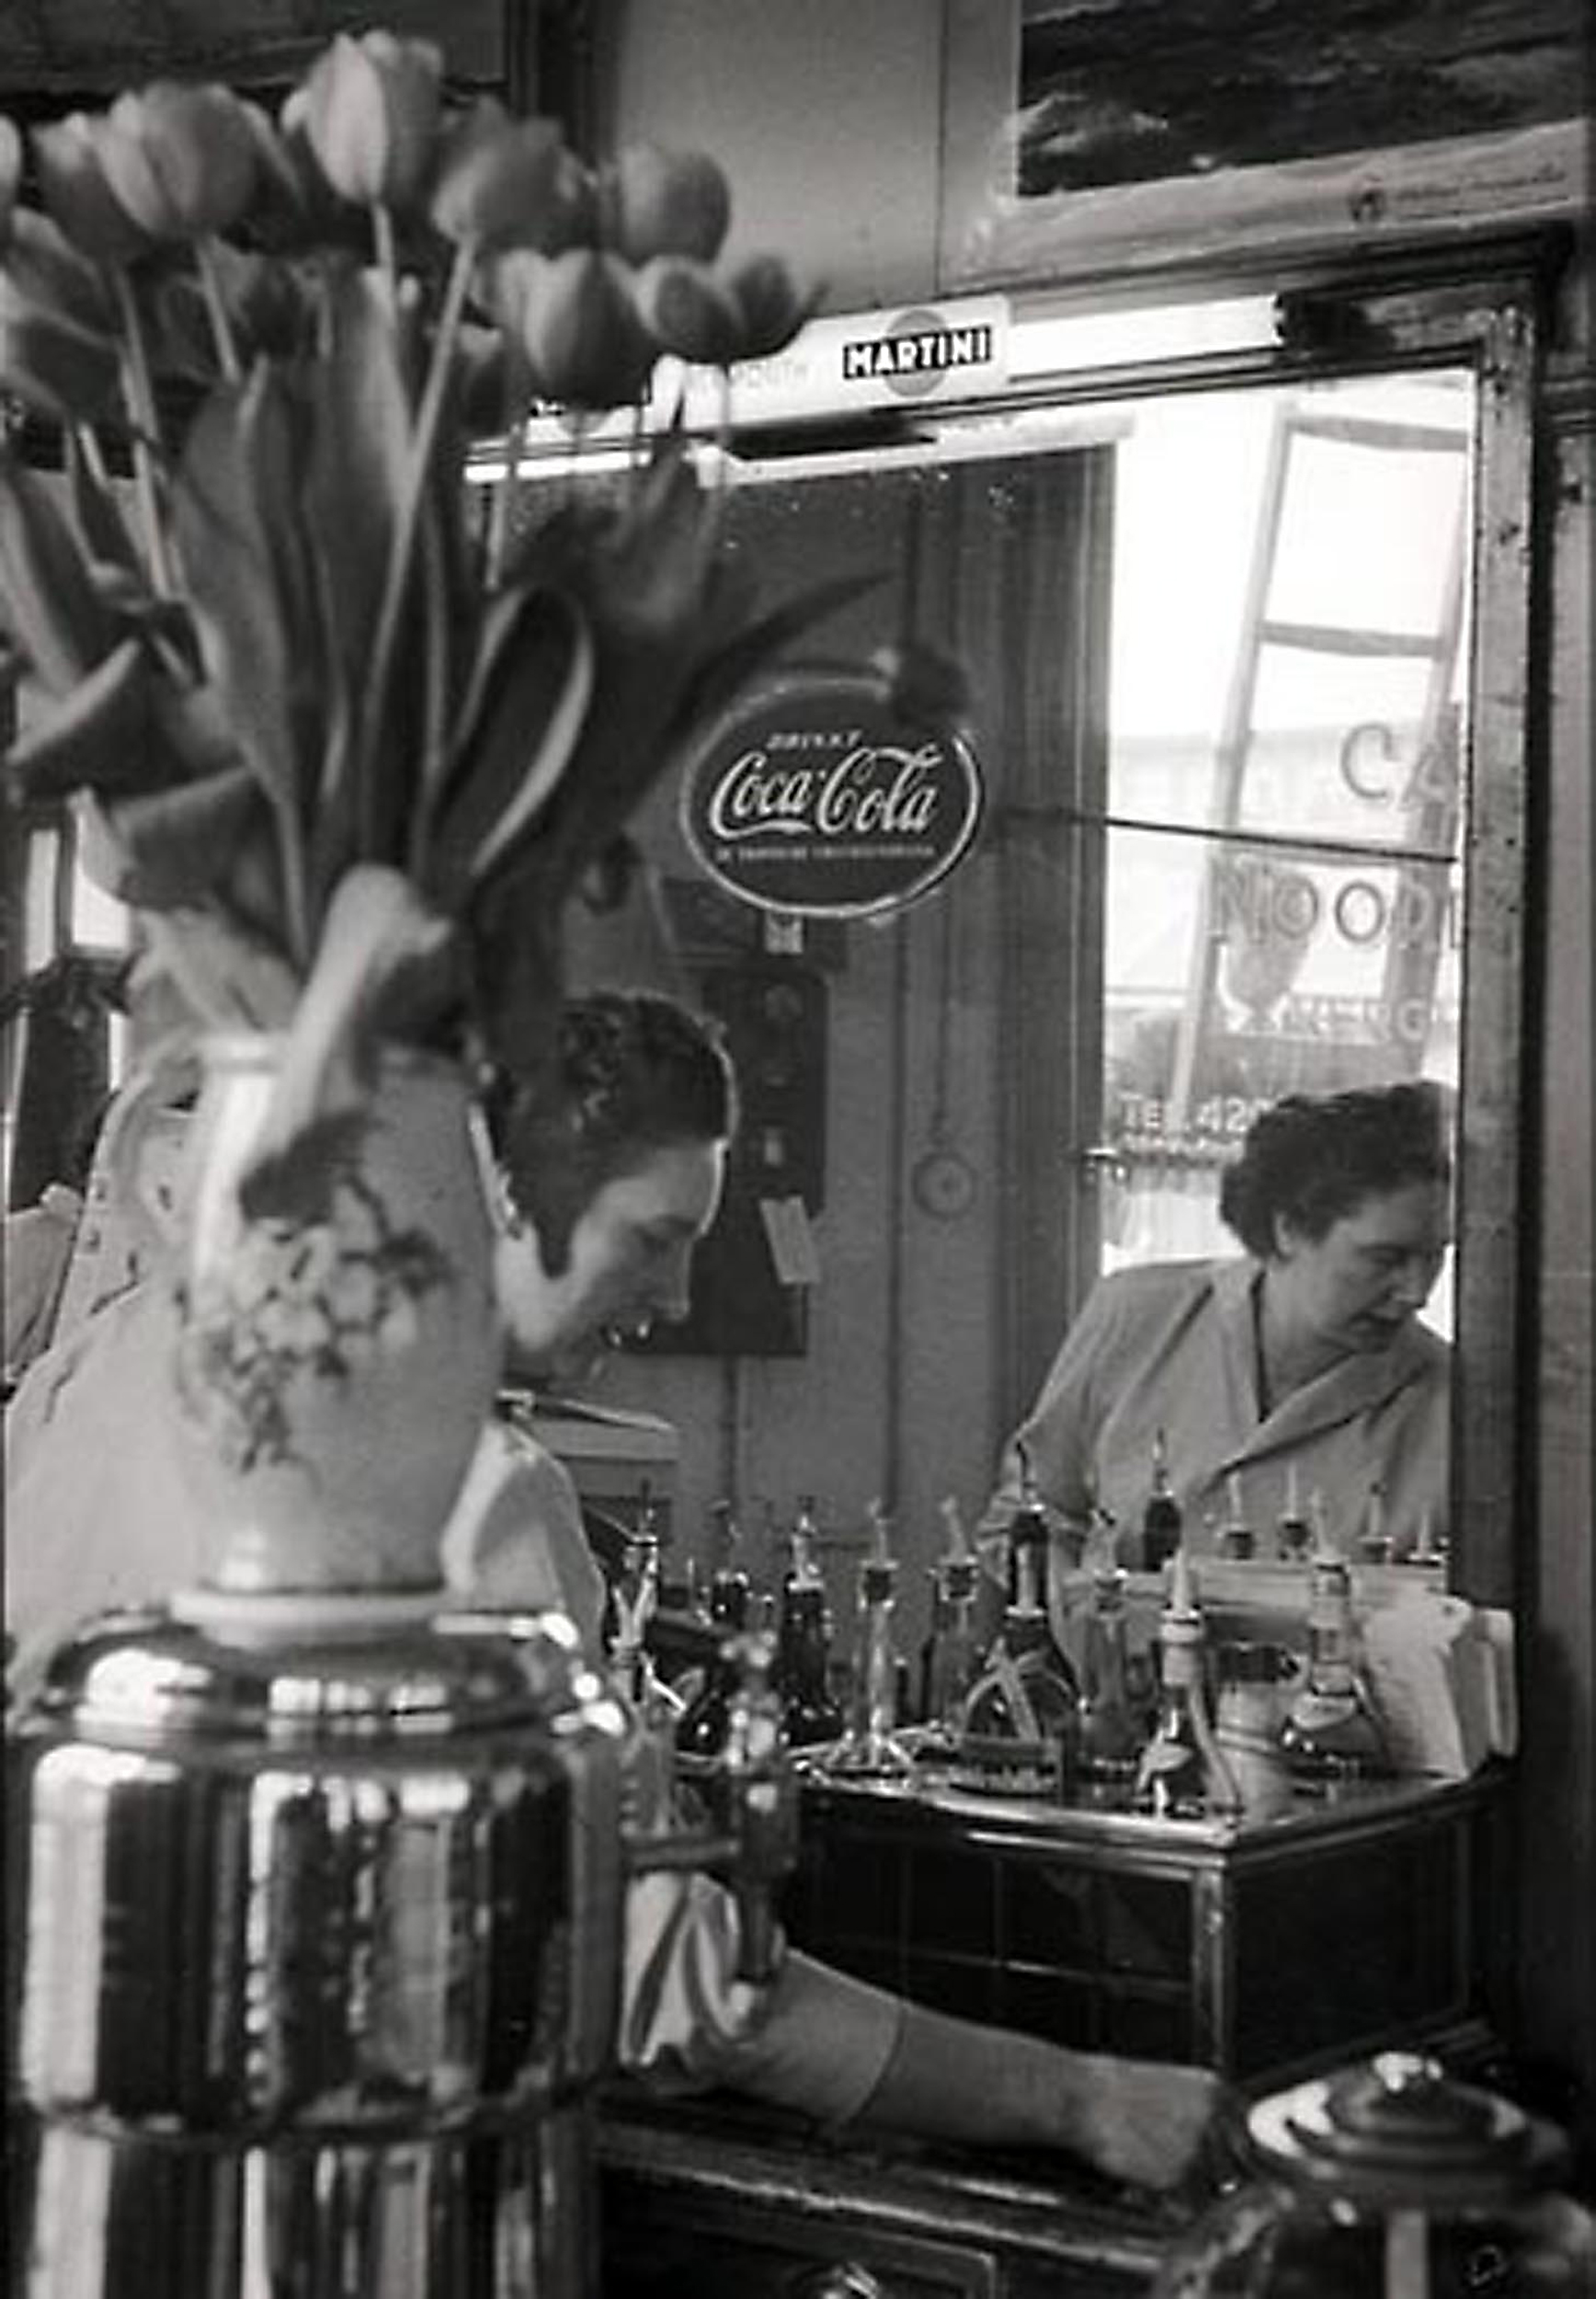 HANNON_tending_bar_(amsterdam)_1956_11x14_high.jpg